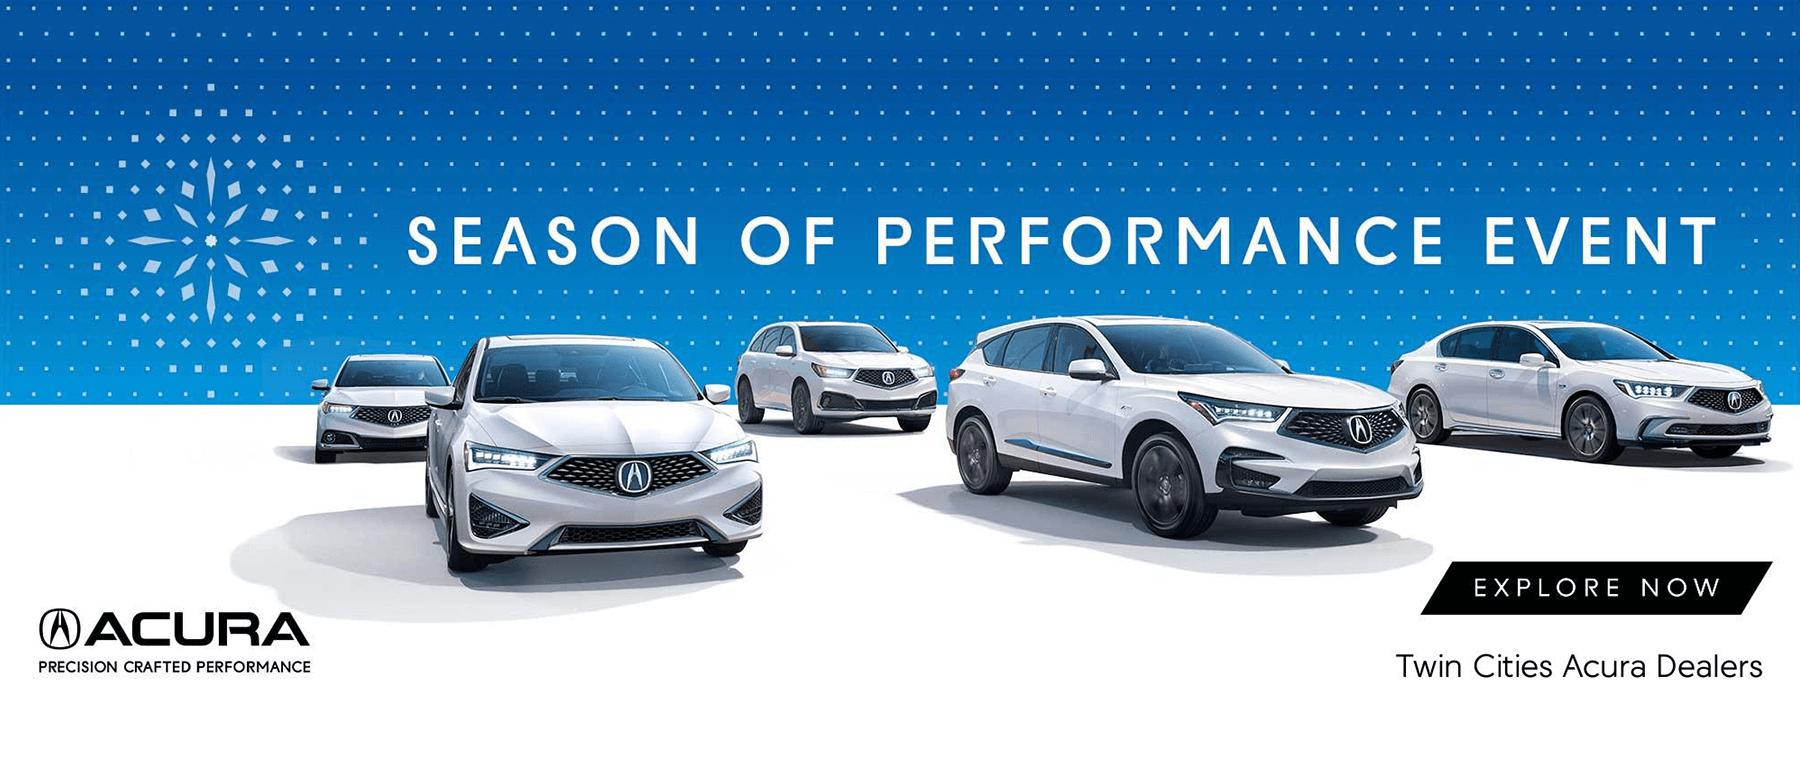 2018 Acura Season of Performance Event